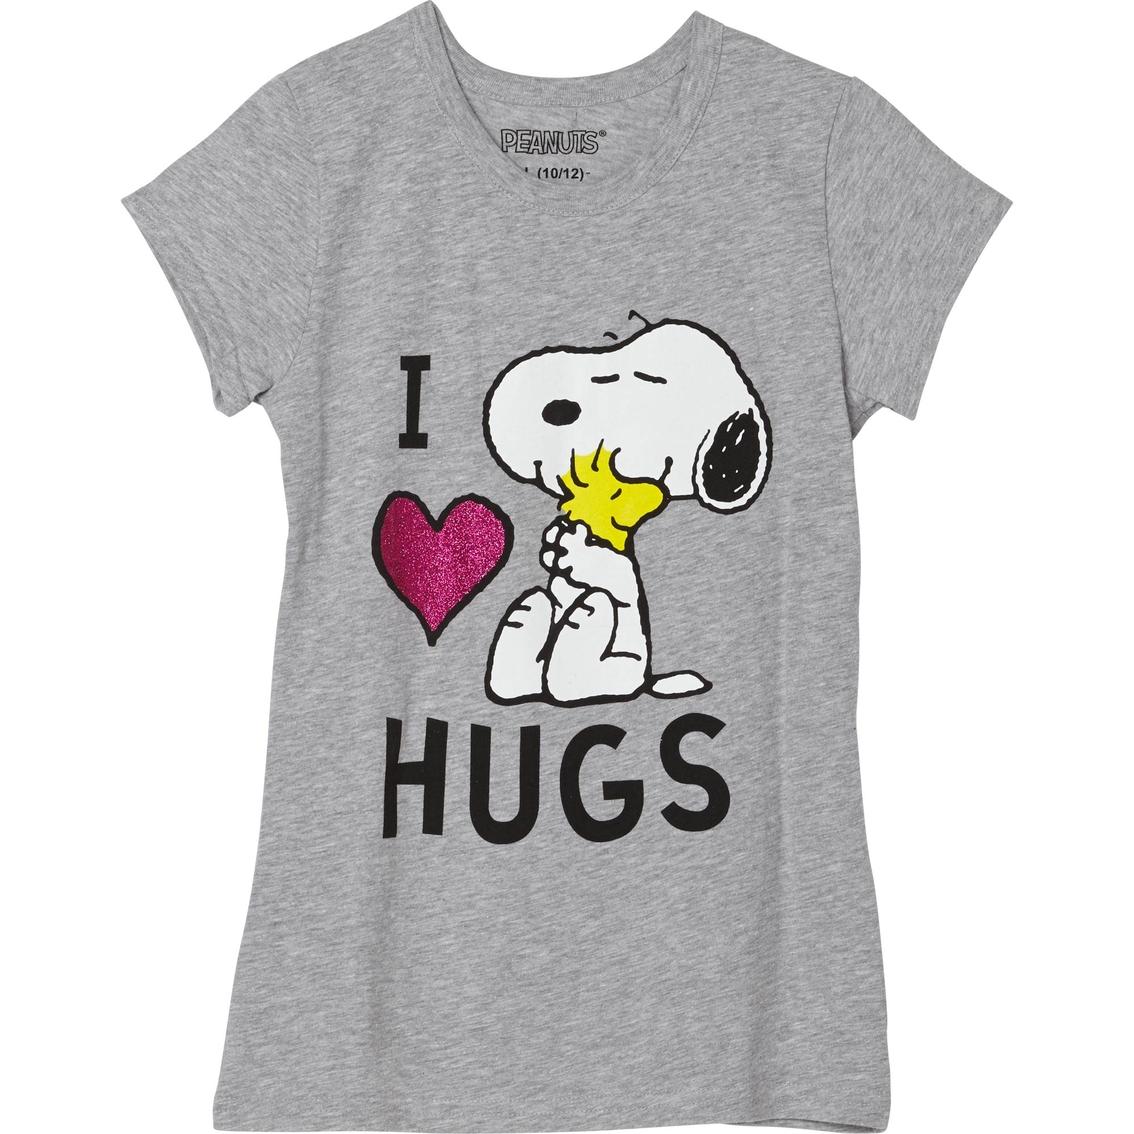 f44ead4eaef474 Peanuts Girls Snoopy I Love Hugs Tee | Girls 7-16 | Apparel | Shop ...